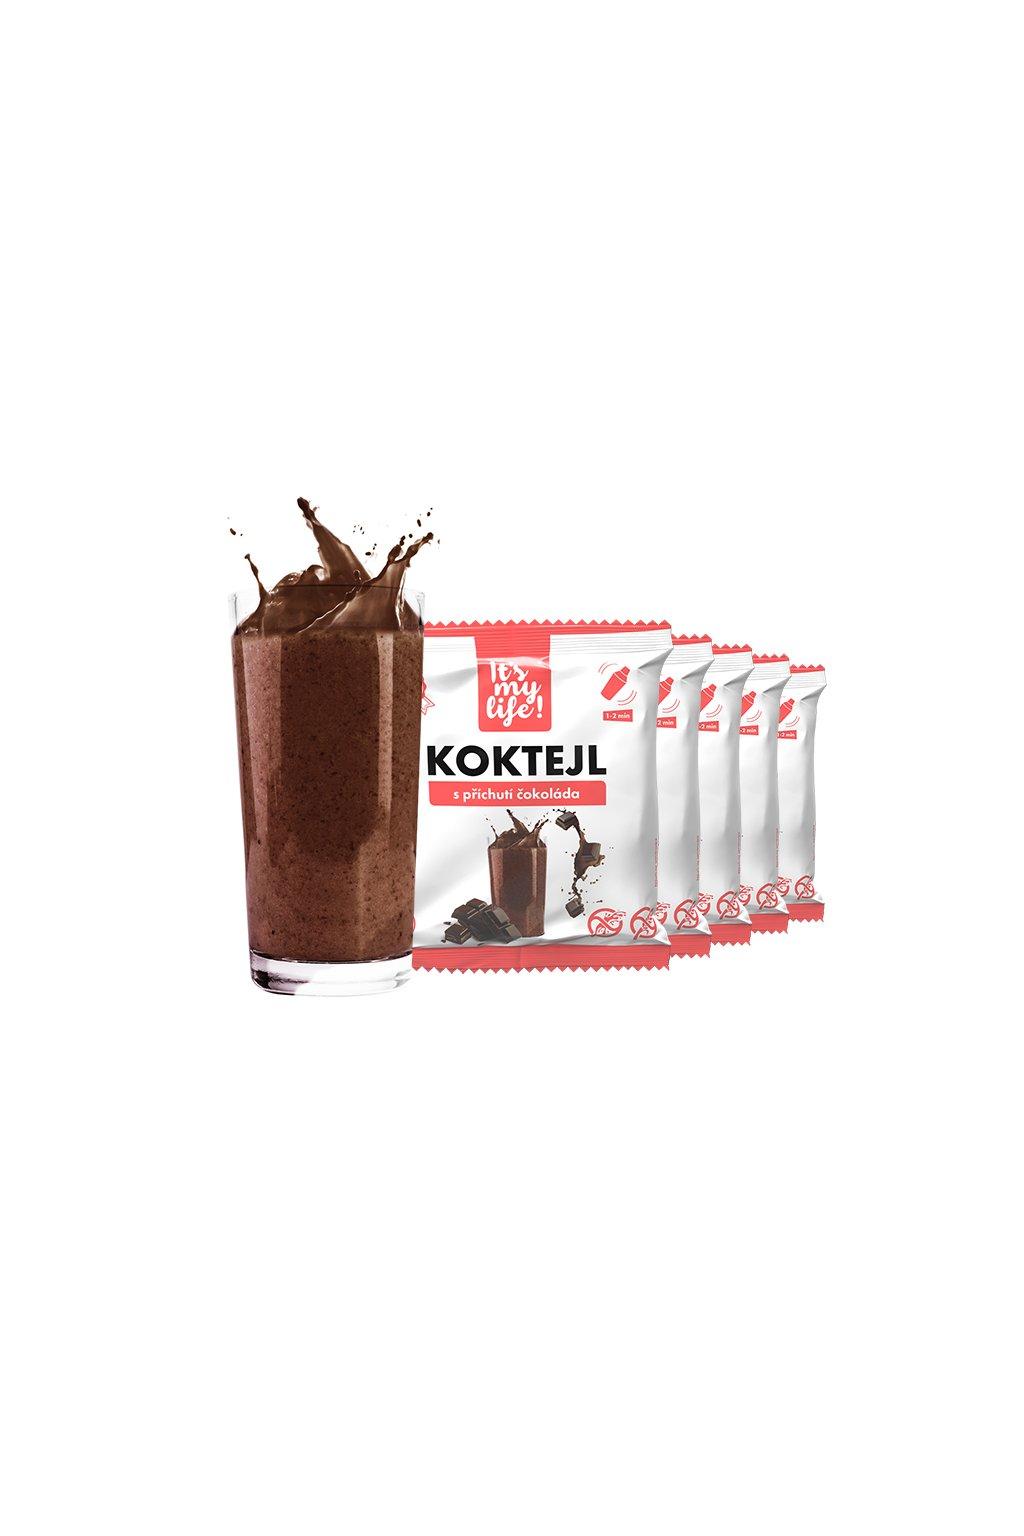 Čokoládové proteínové koktaily, 200g (5porcií)